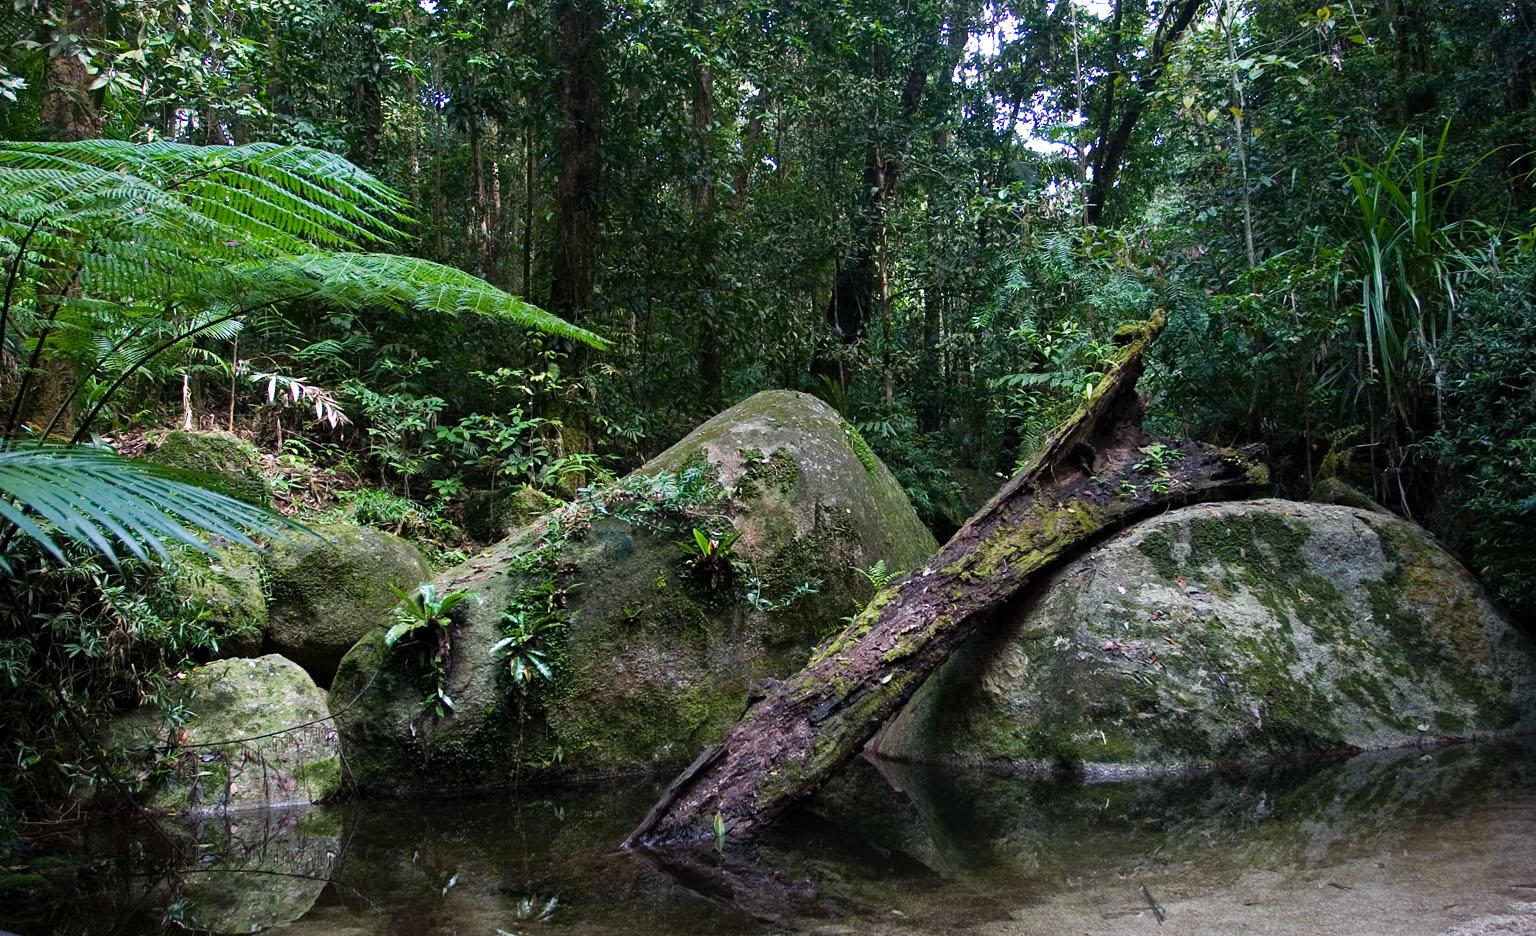 Save the Daintree rainforest